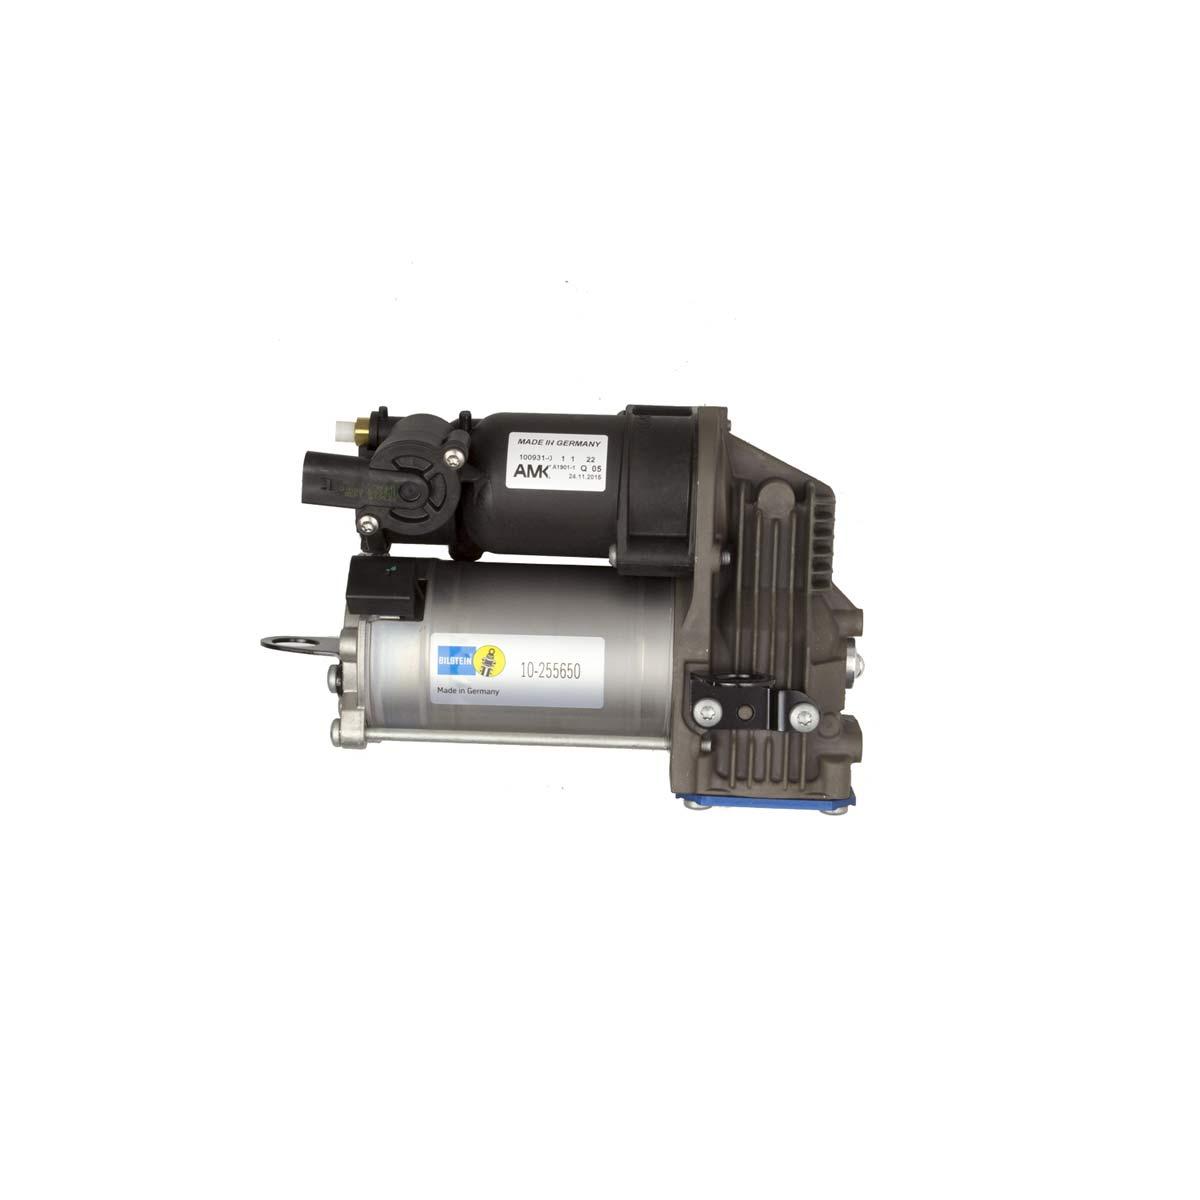 Bilstein 10-255650 | B1 OE Replacement (Air) Air Suspension Compressor  Mercedes Benz GL550